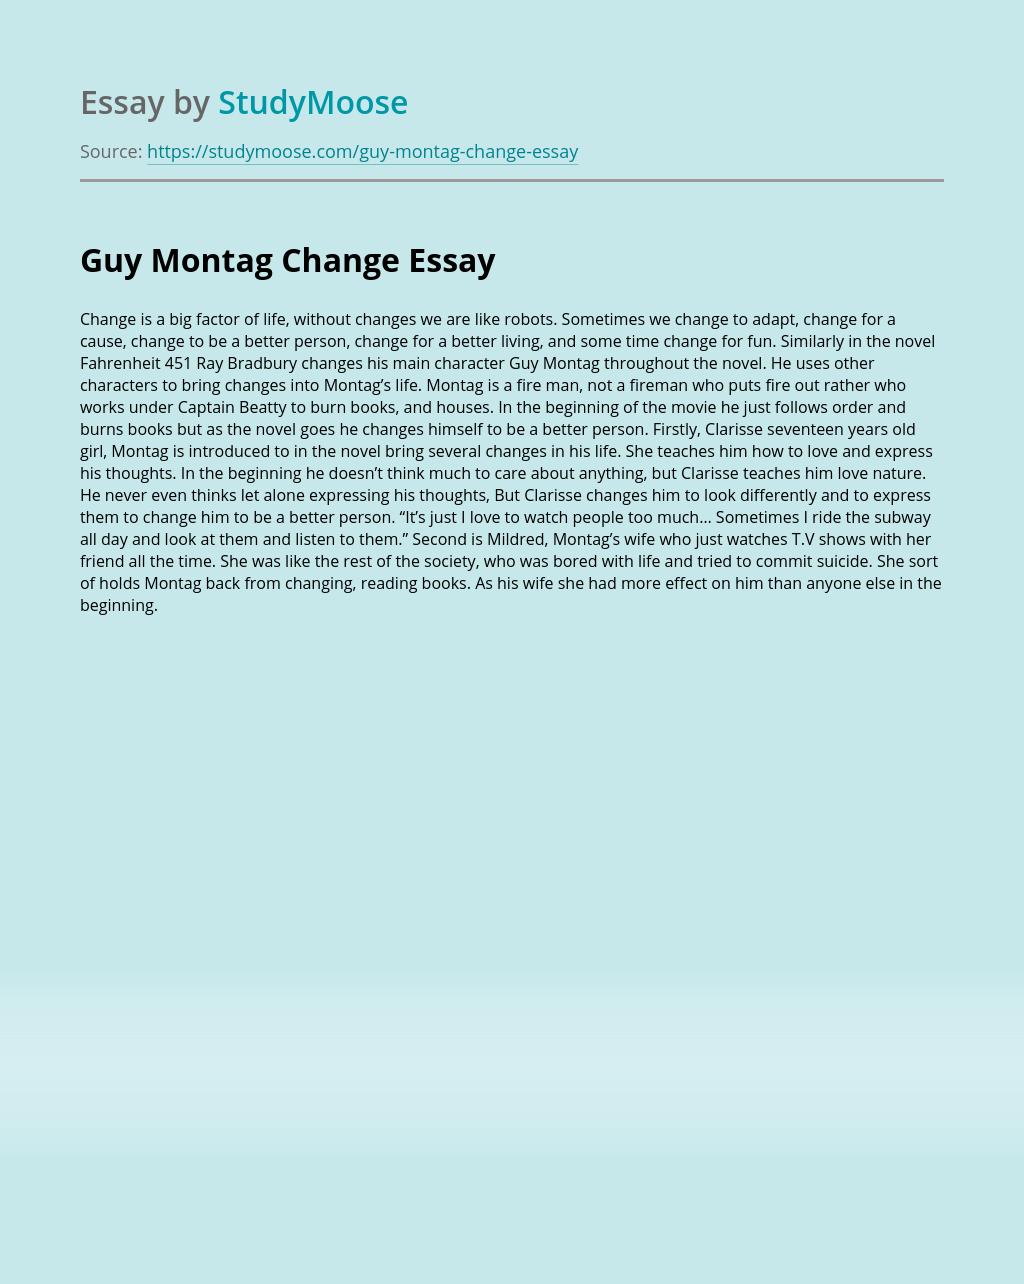 Guy Montag Change